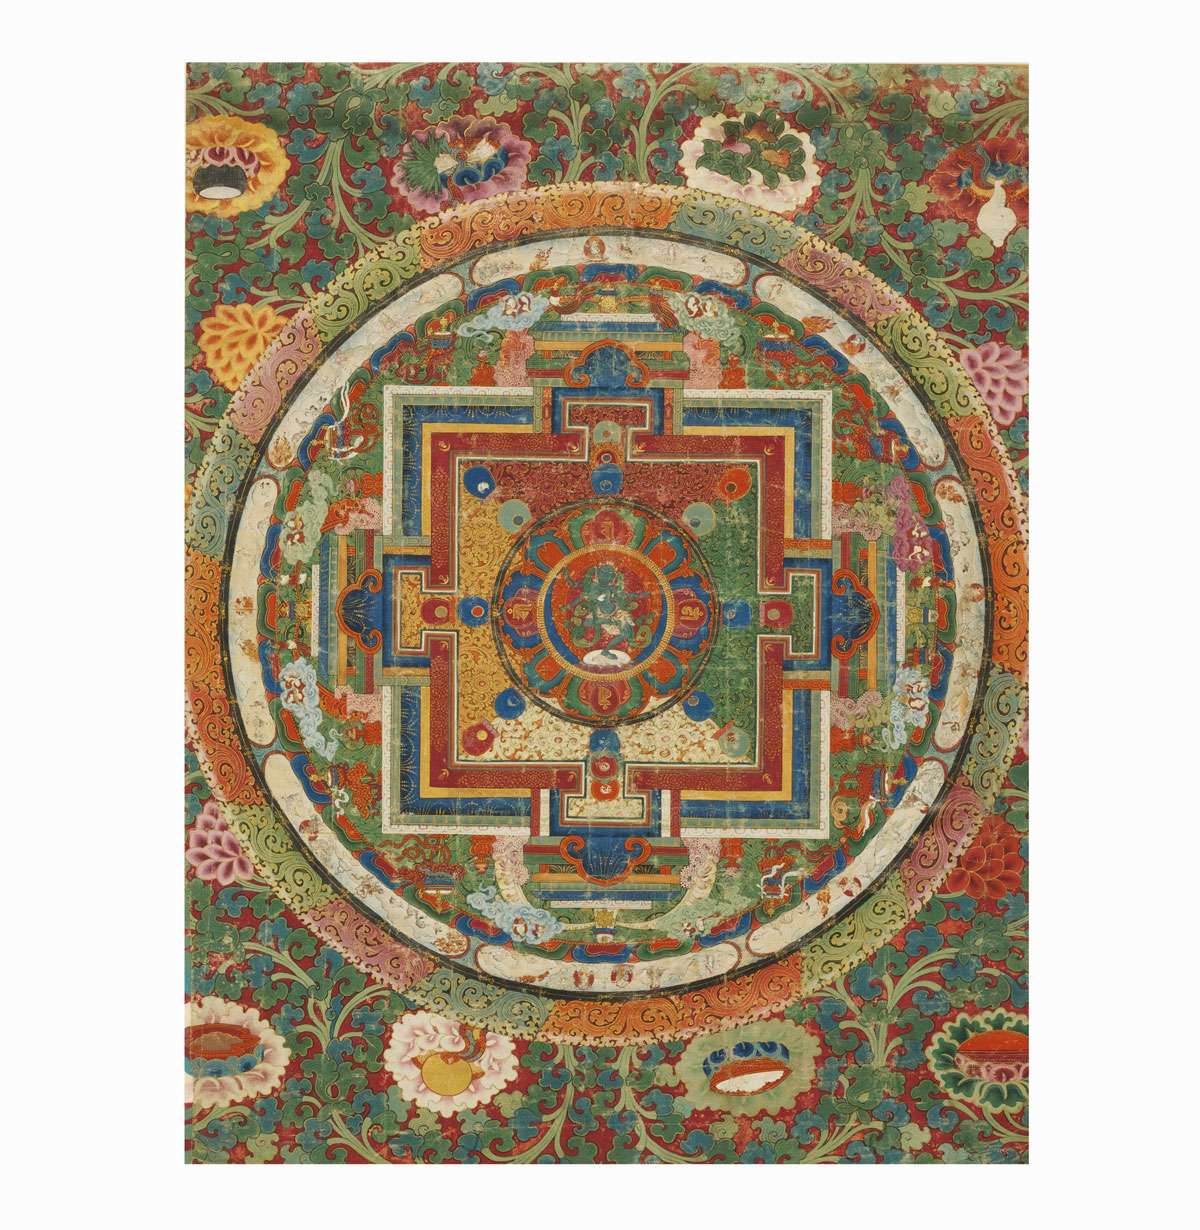 antiquités asiatiques. mandala tibet, prix, estimation, expertise, achat vente, vendre, art tibet.